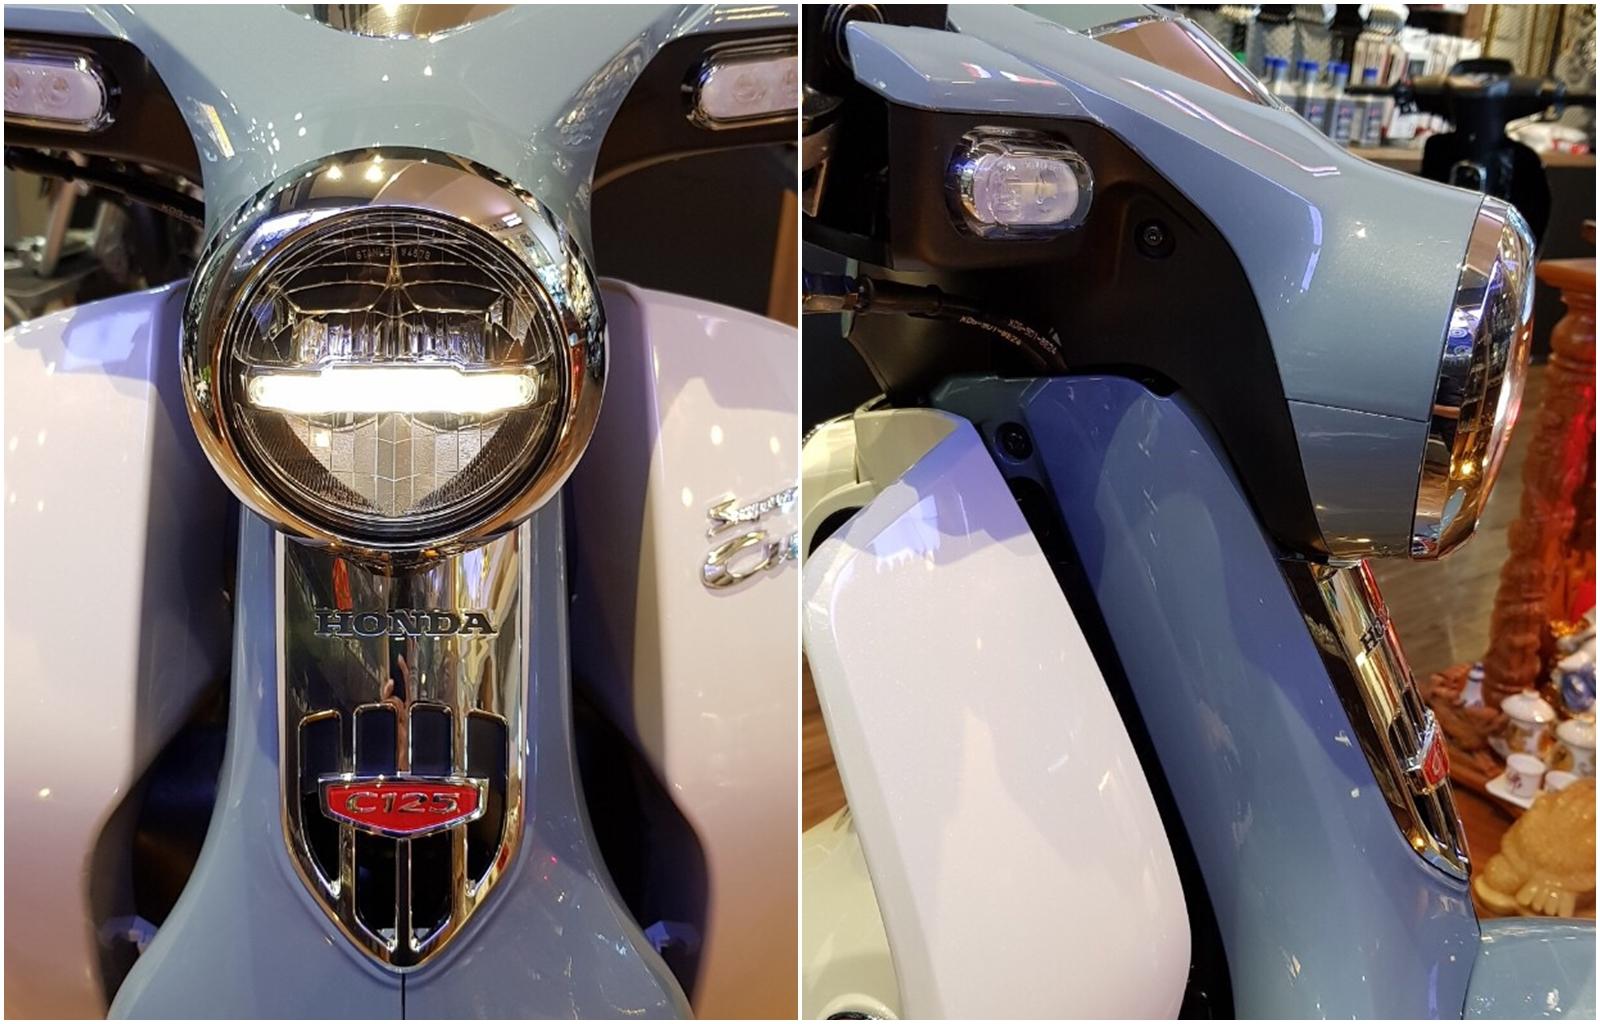 honda-super-cub-c125-autodaily-14.jpg